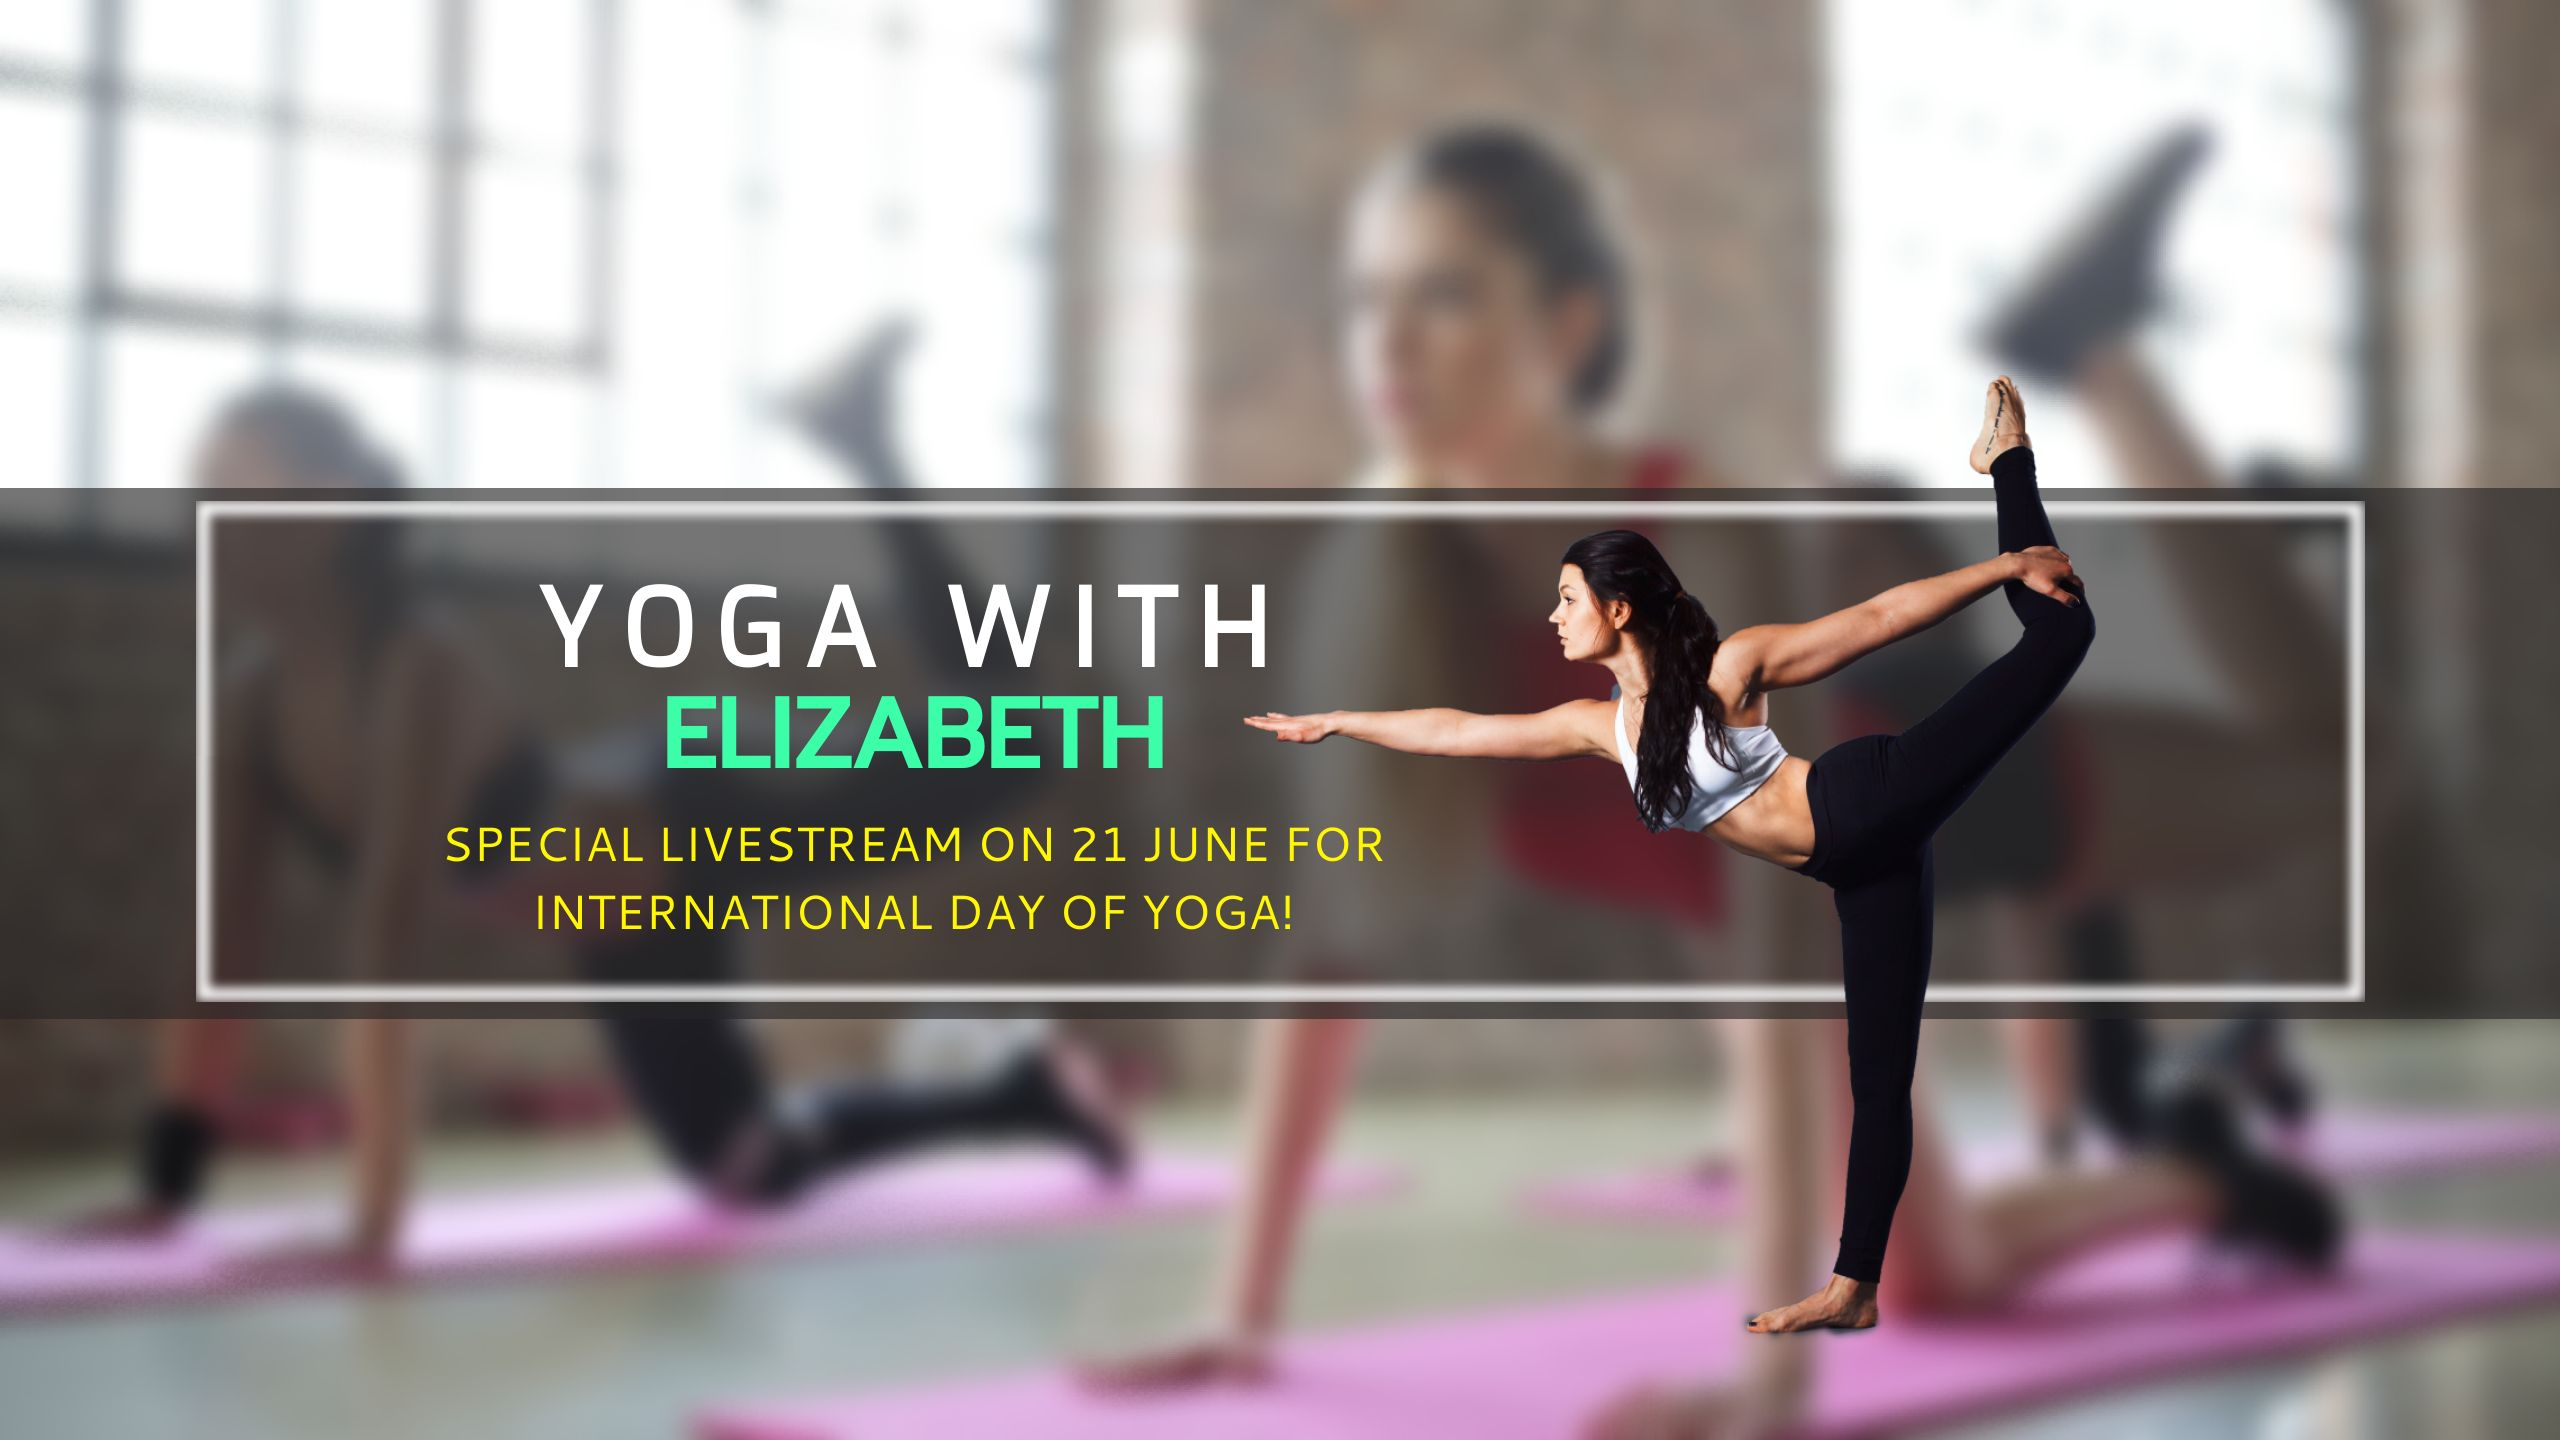 International Day of Yoga Youtube Channel Art